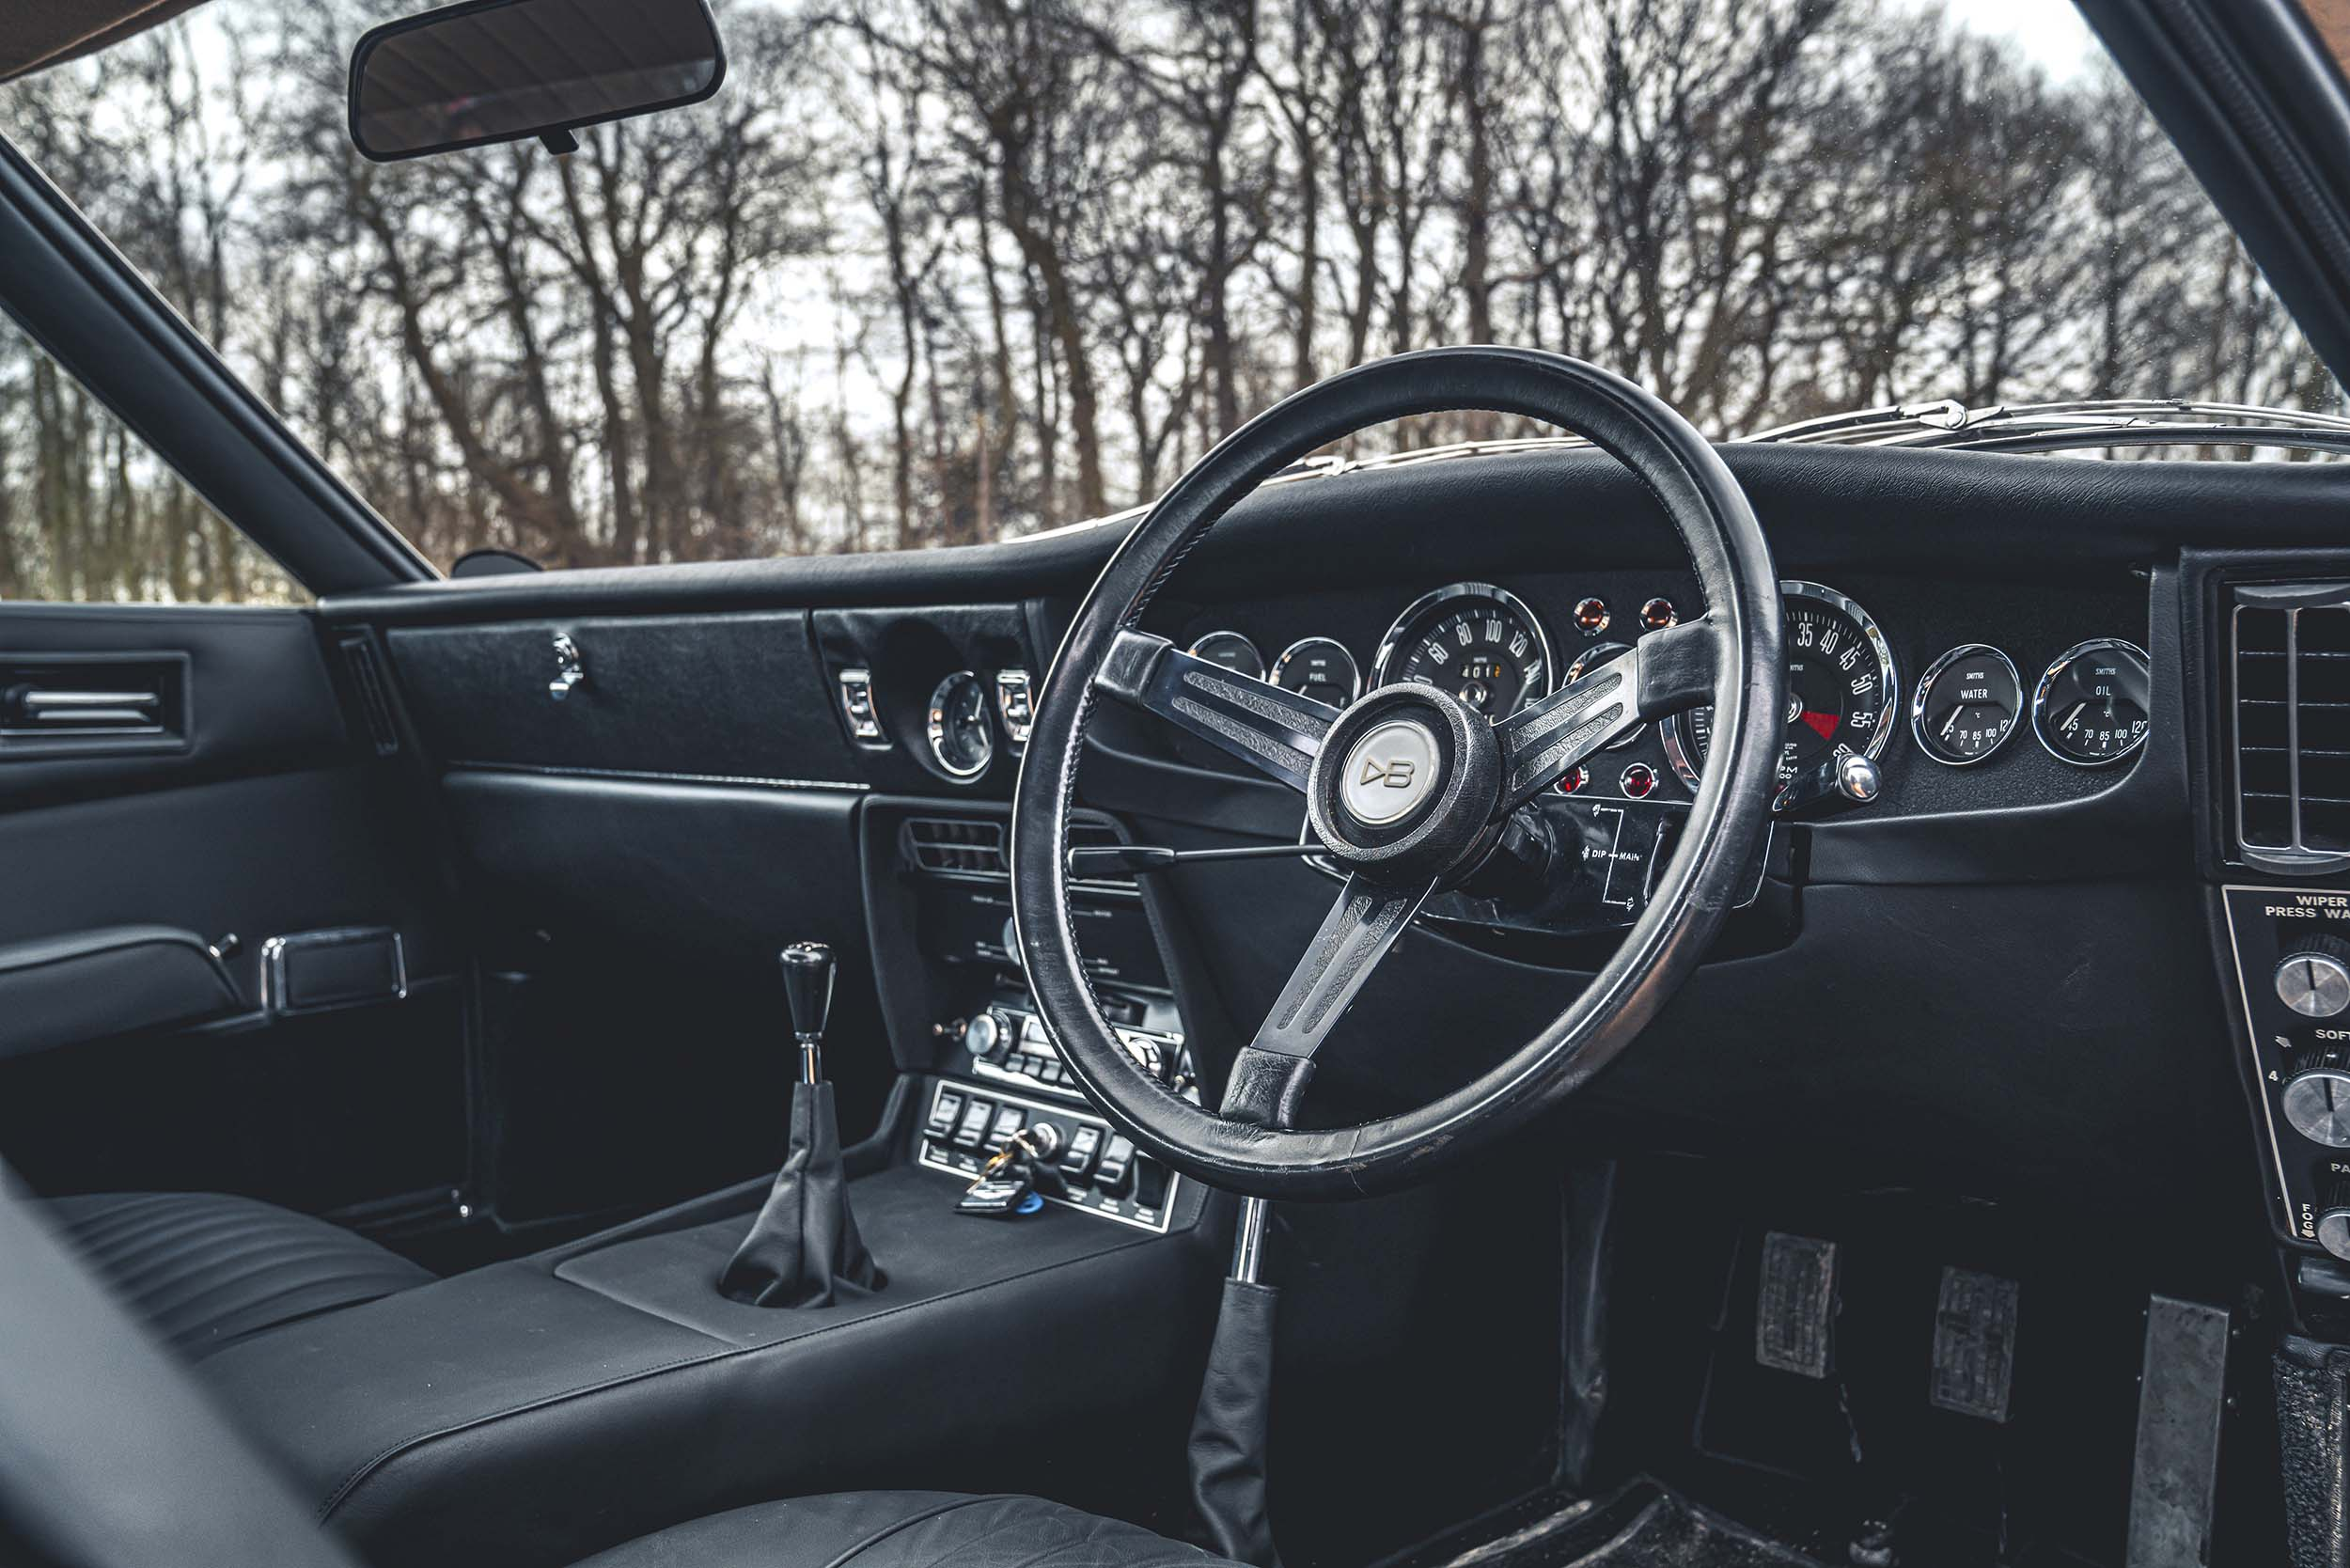 Aston Martin DBS van James Bond (007)